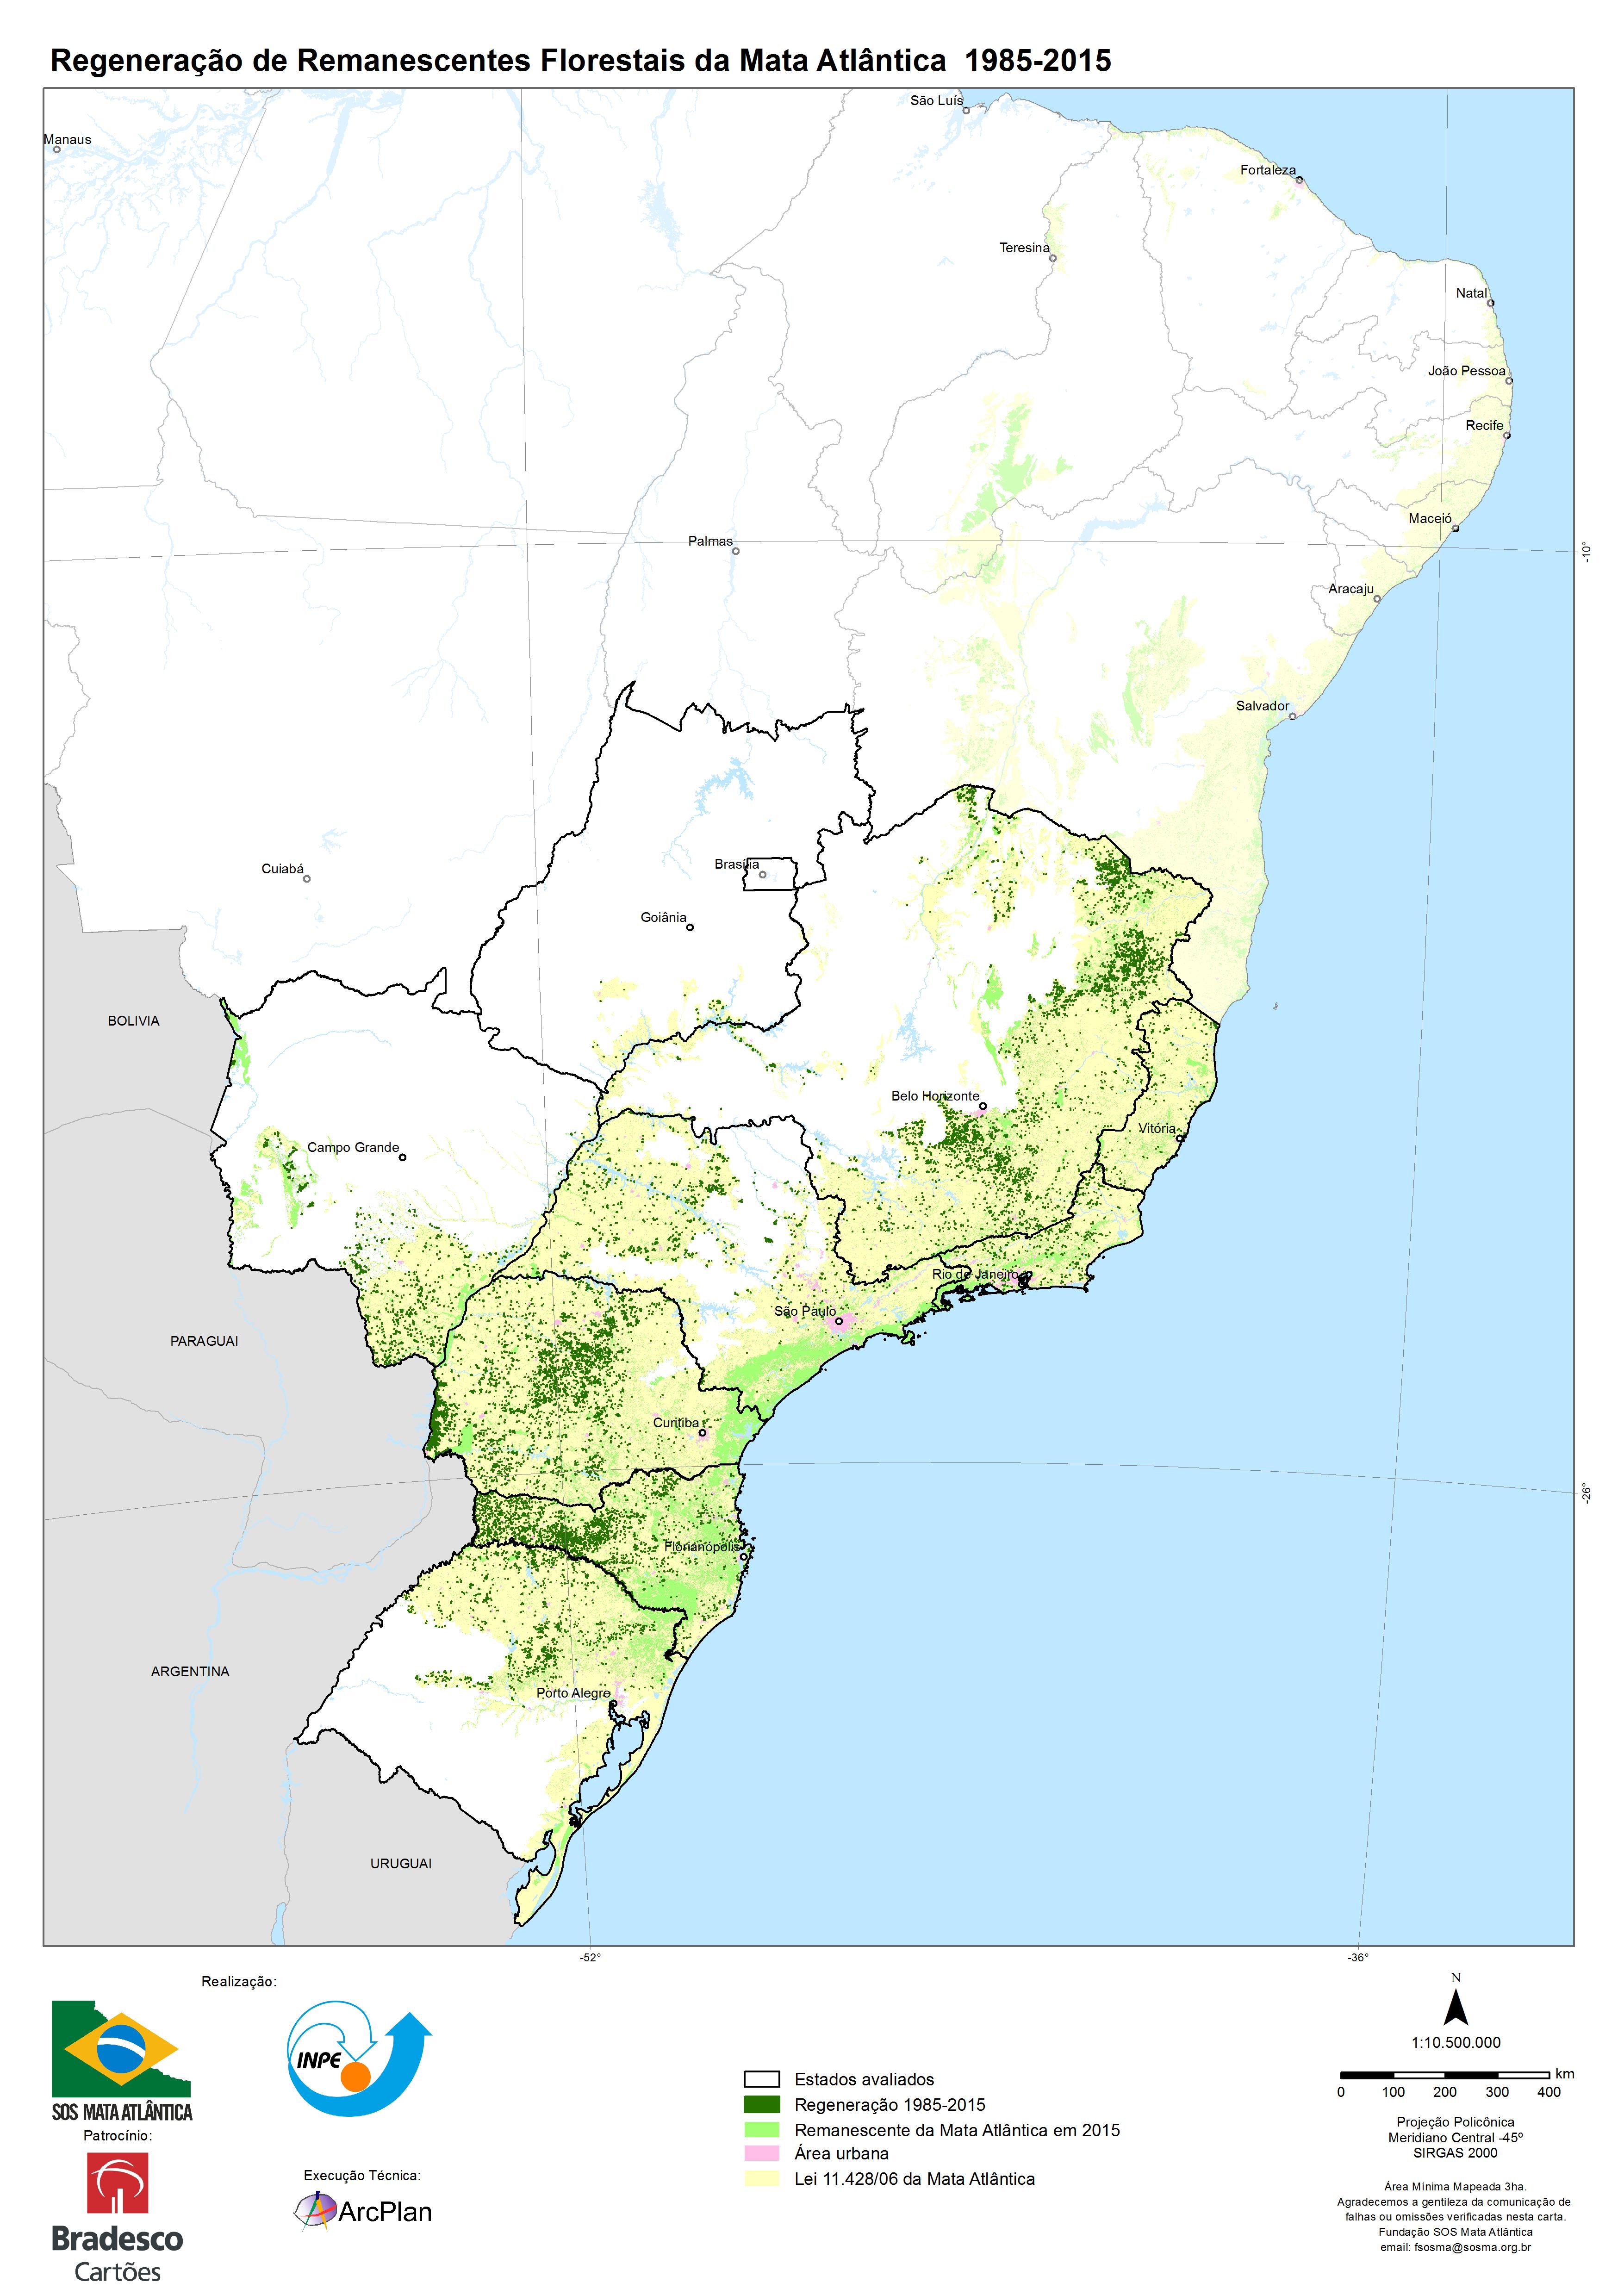 Brasil_A3_retrato_1985_2015_300dpi